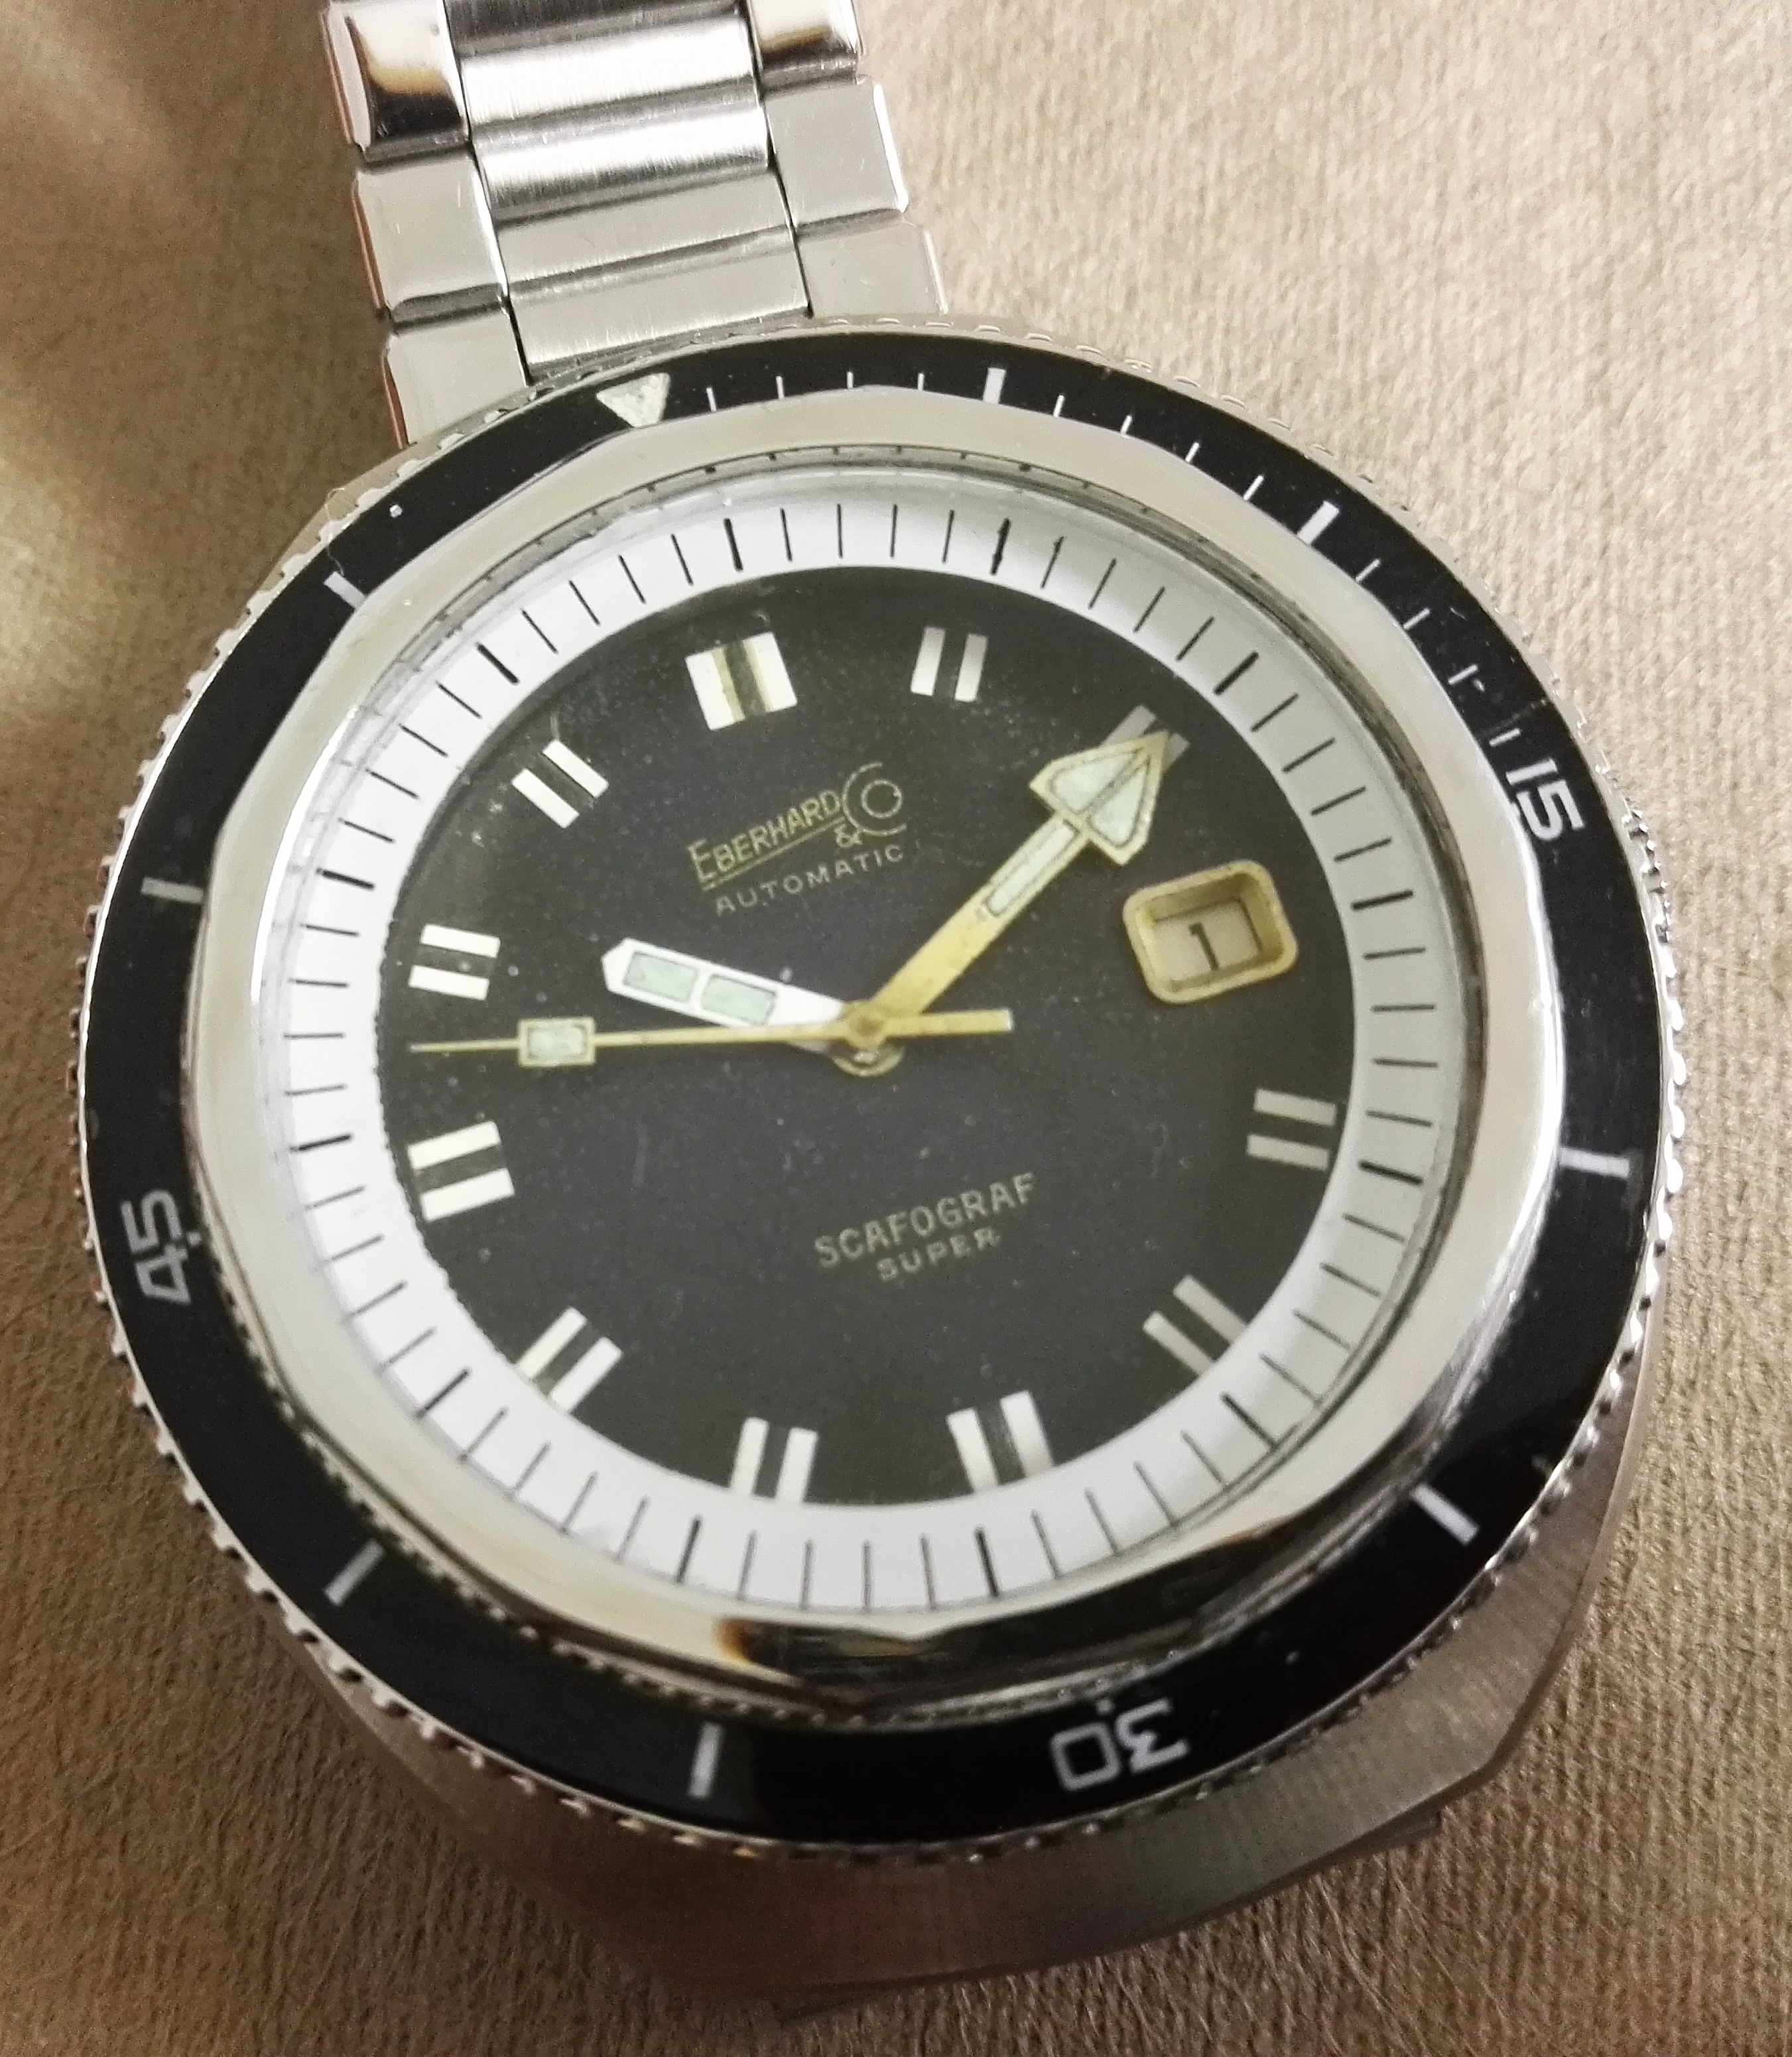 Eberhard & Co. Scafo scafograf 500 super rare gilt dial top condition | San Giorgio a Cremano